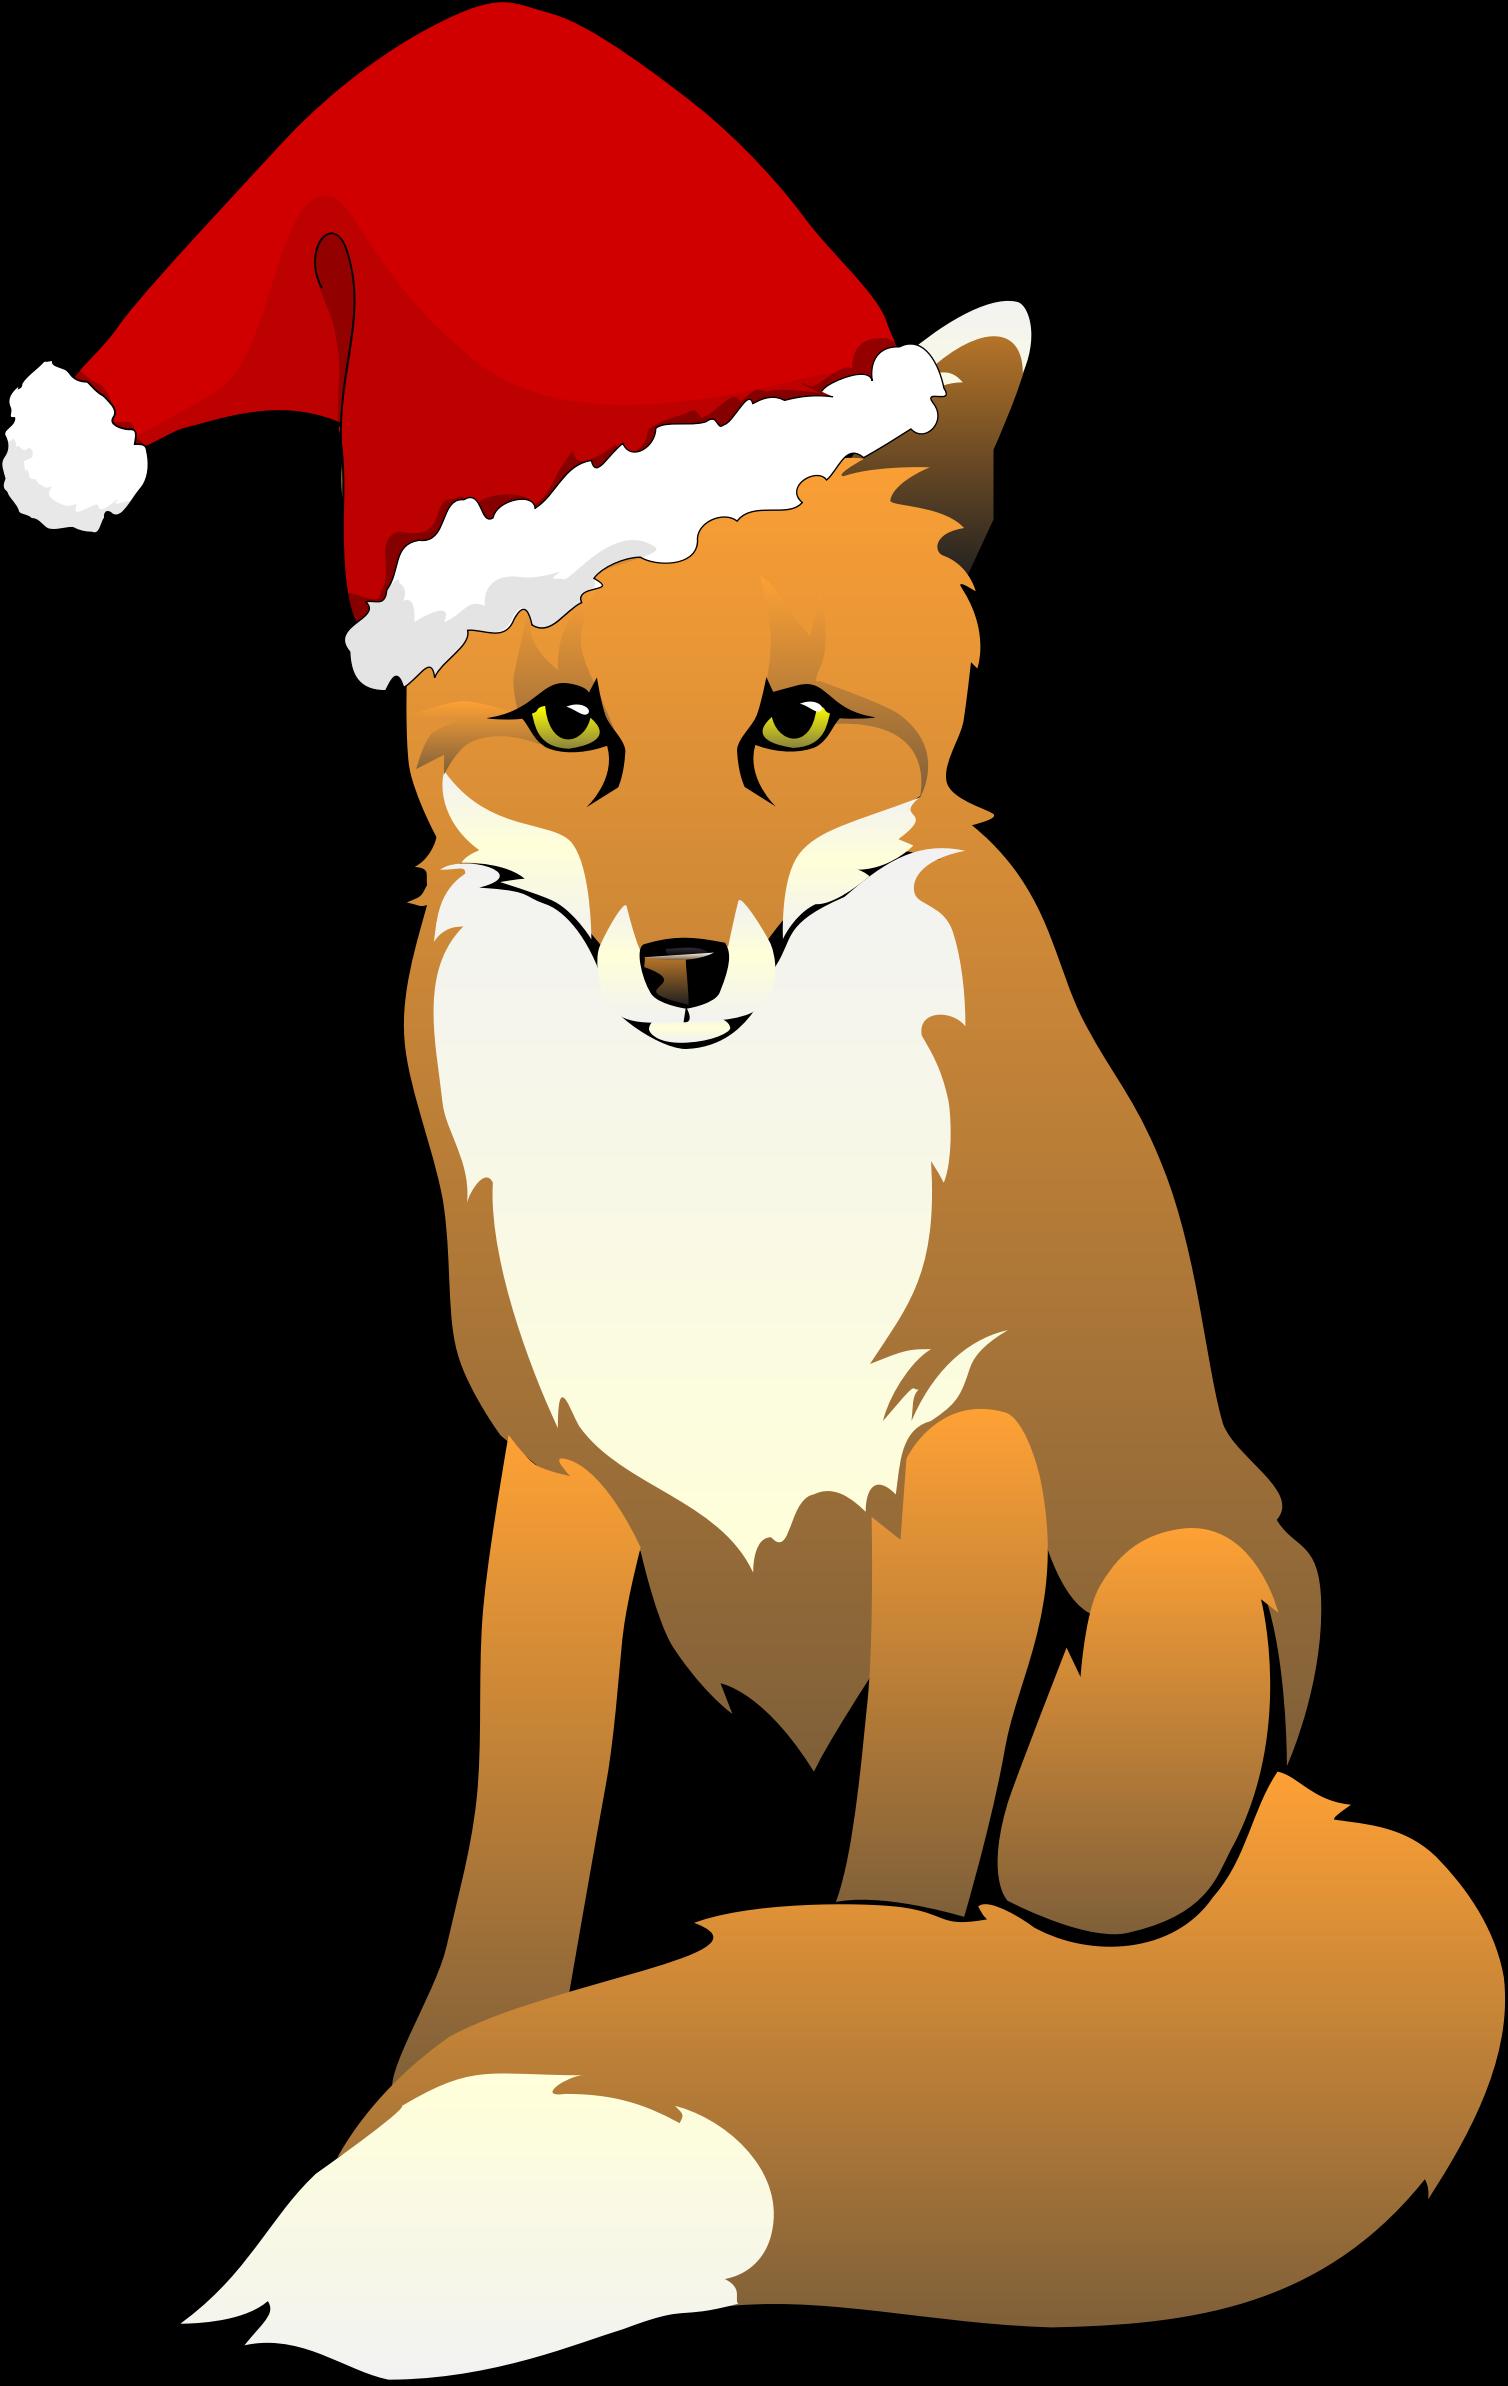 Fox clipart cartoon. Wearing santa hat big